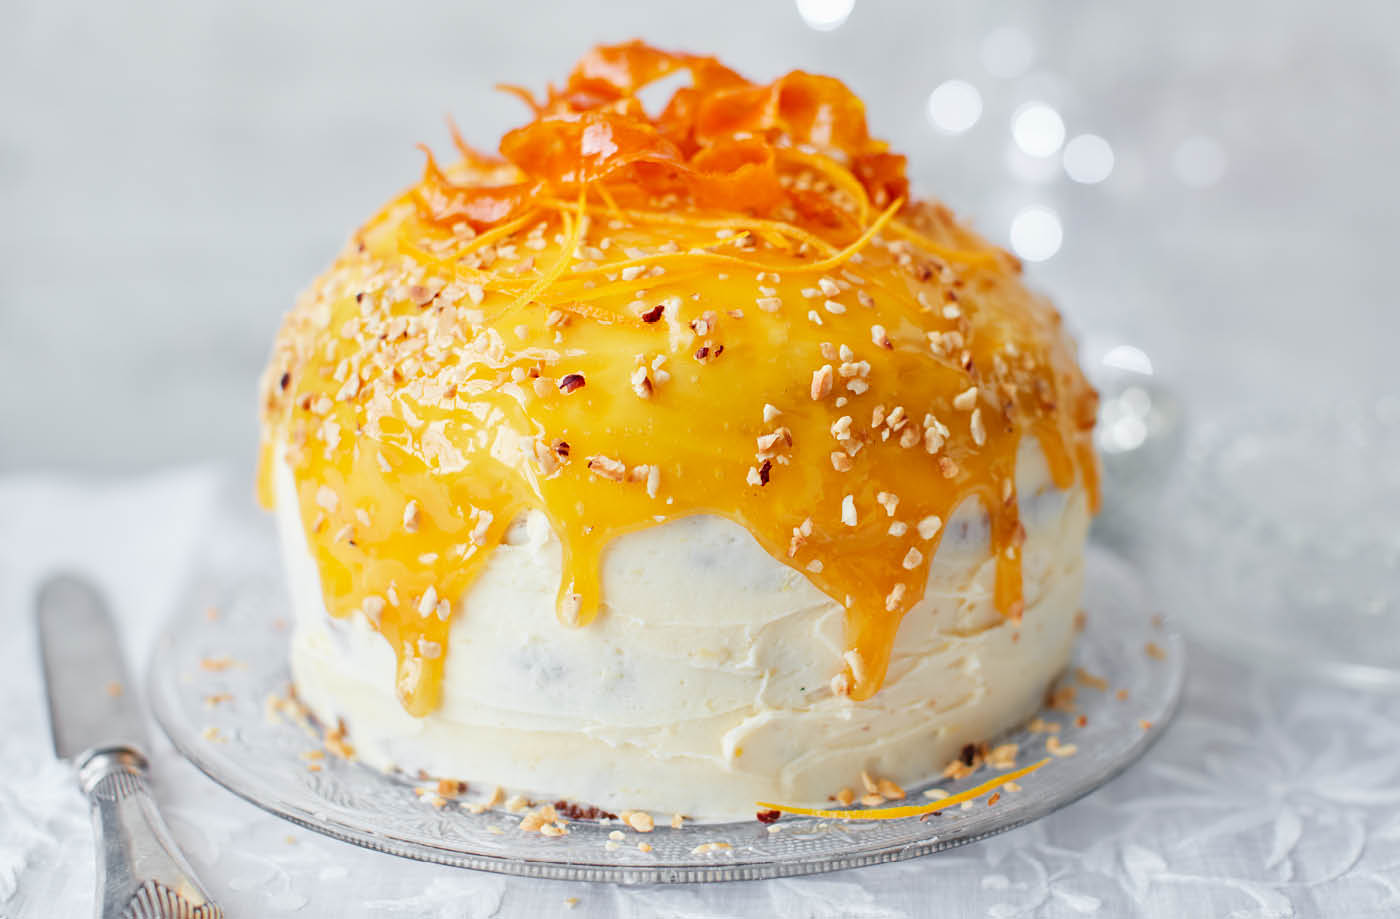 Christmas Cake With Orange Liqueur